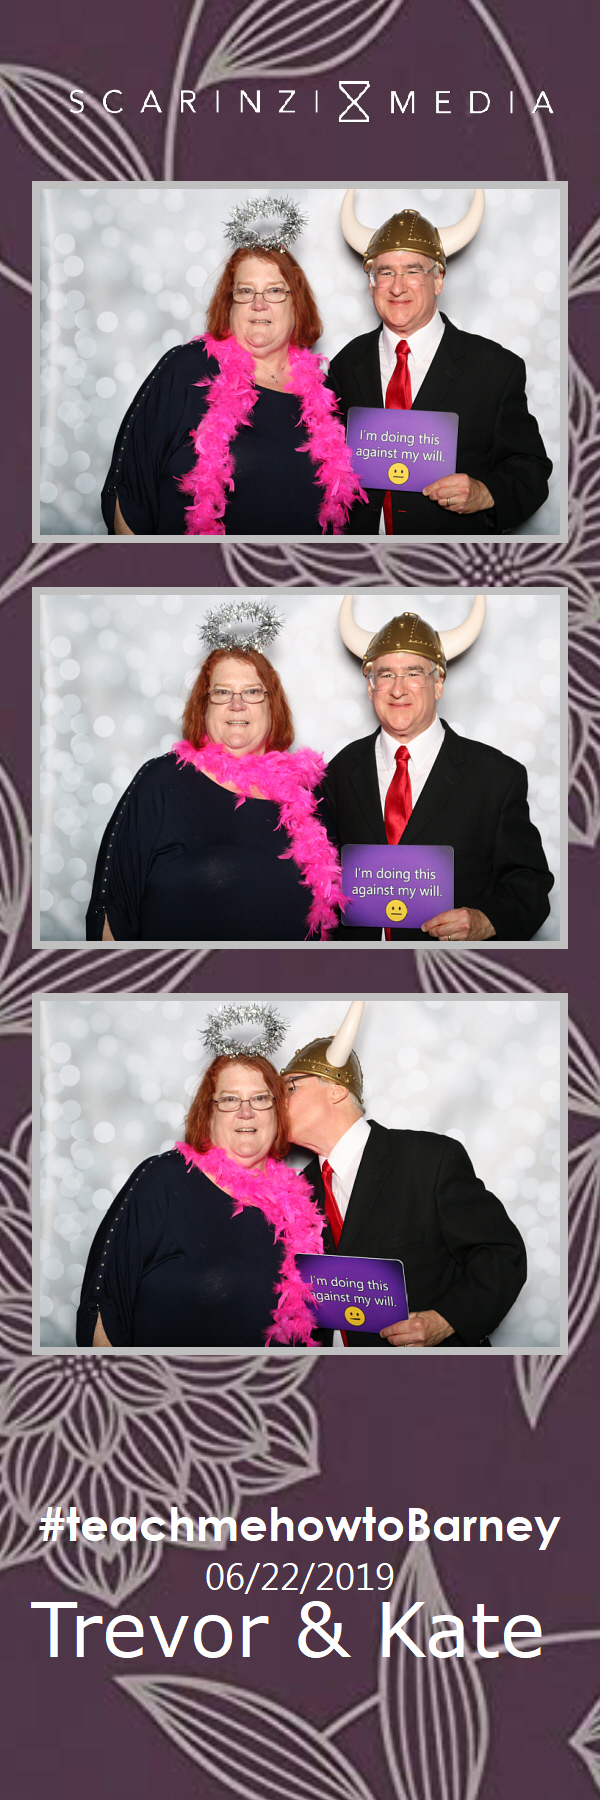 2019.06.22 - Barney Wedding PHOTOBOOTH44.jpg